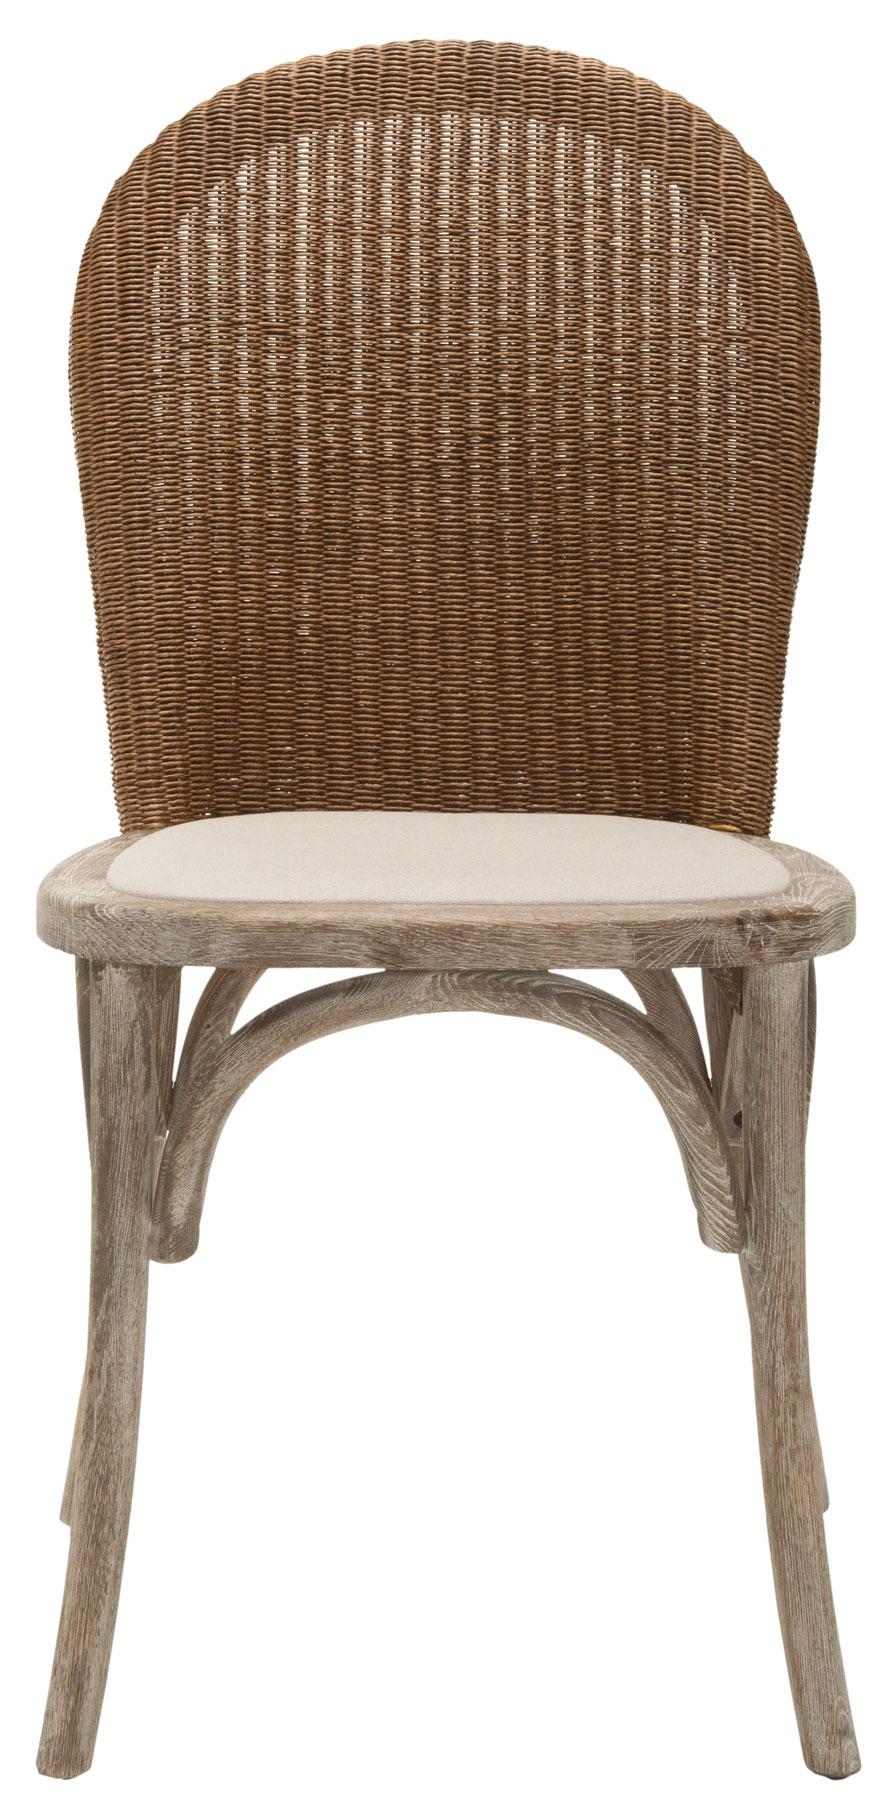 MCR4599A-SET2 Dining Chairs - Furniture by Safavieh  Safavieh